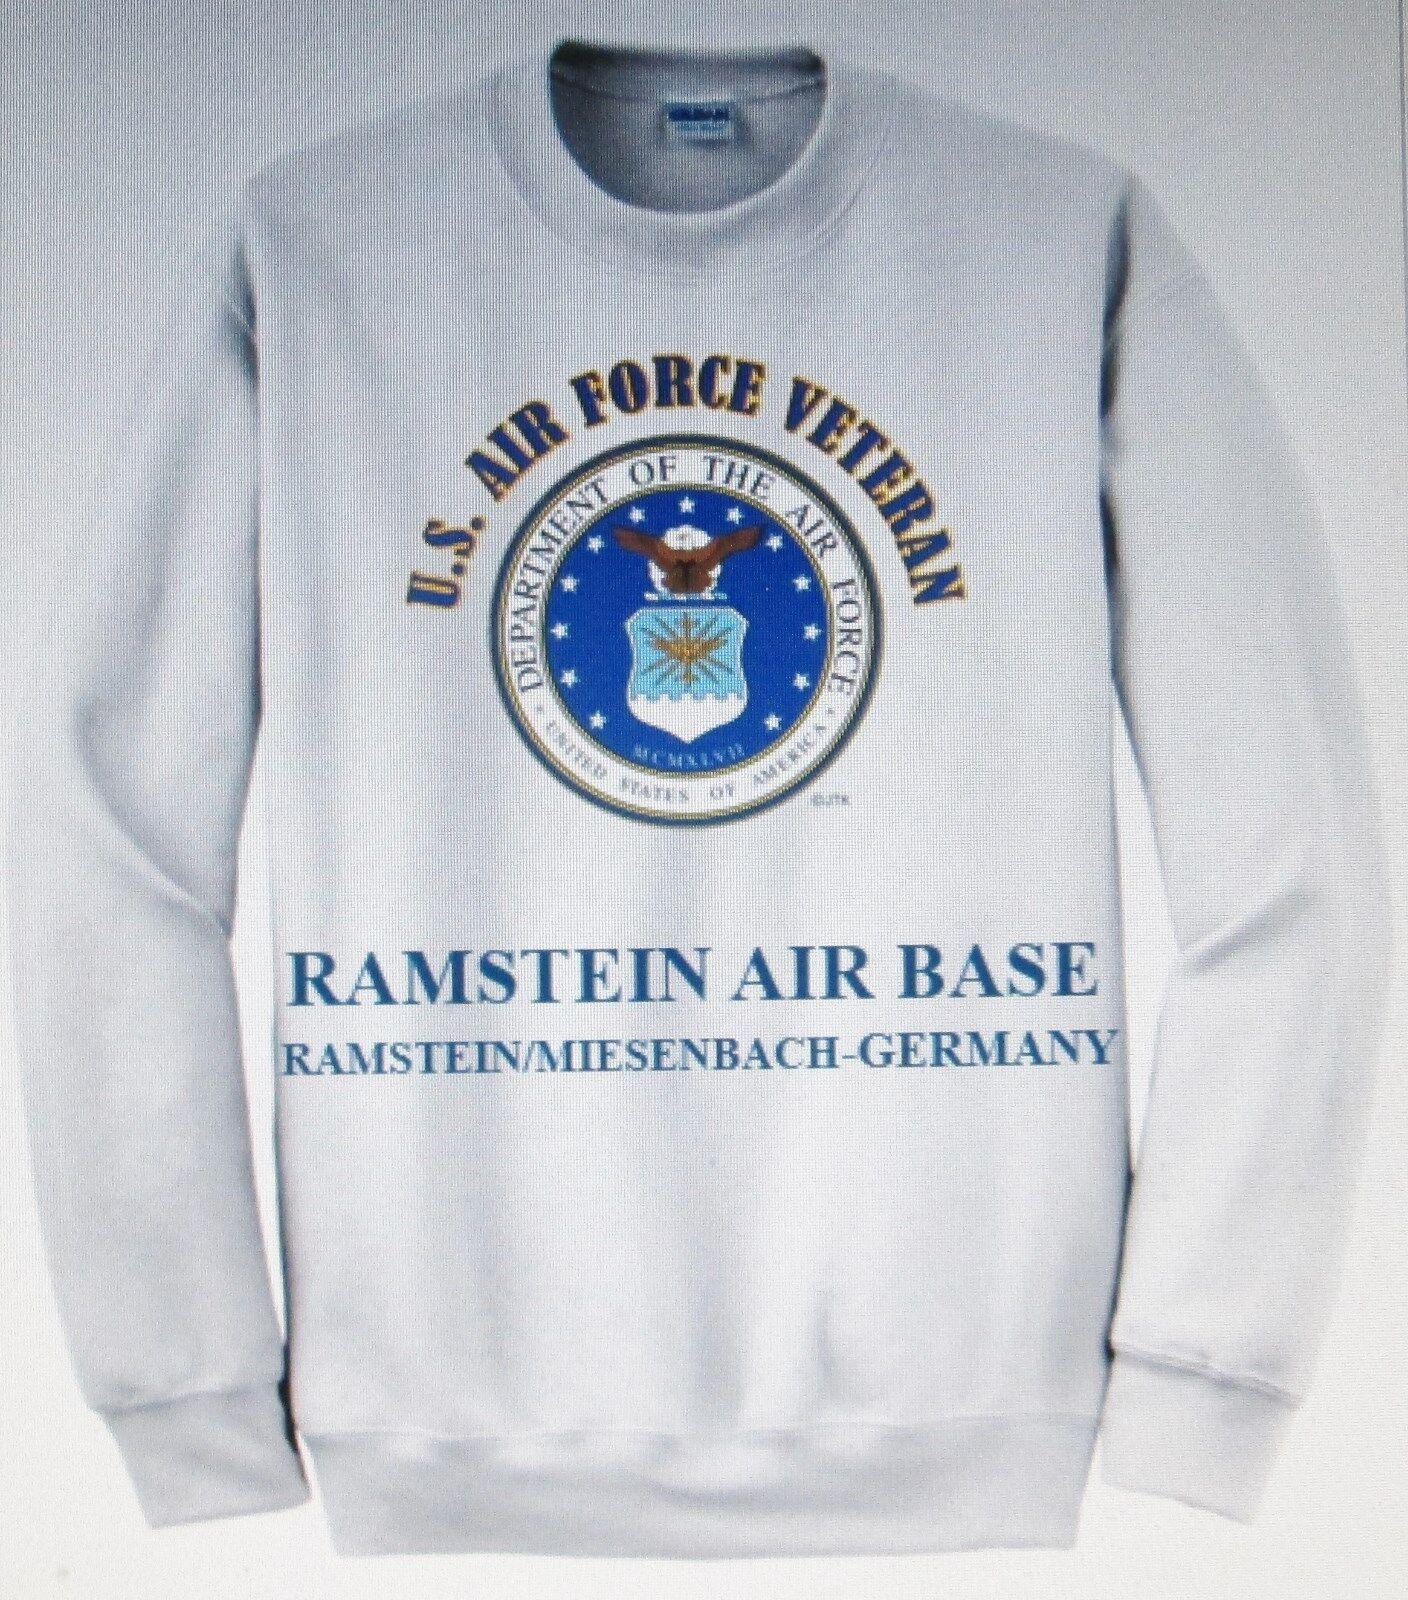 RAMSTEIN AIR BASERAMSTEIN MIESENBACH-GERMANYU.S. AIR FORCE EMBLEM SWEATSHIRT